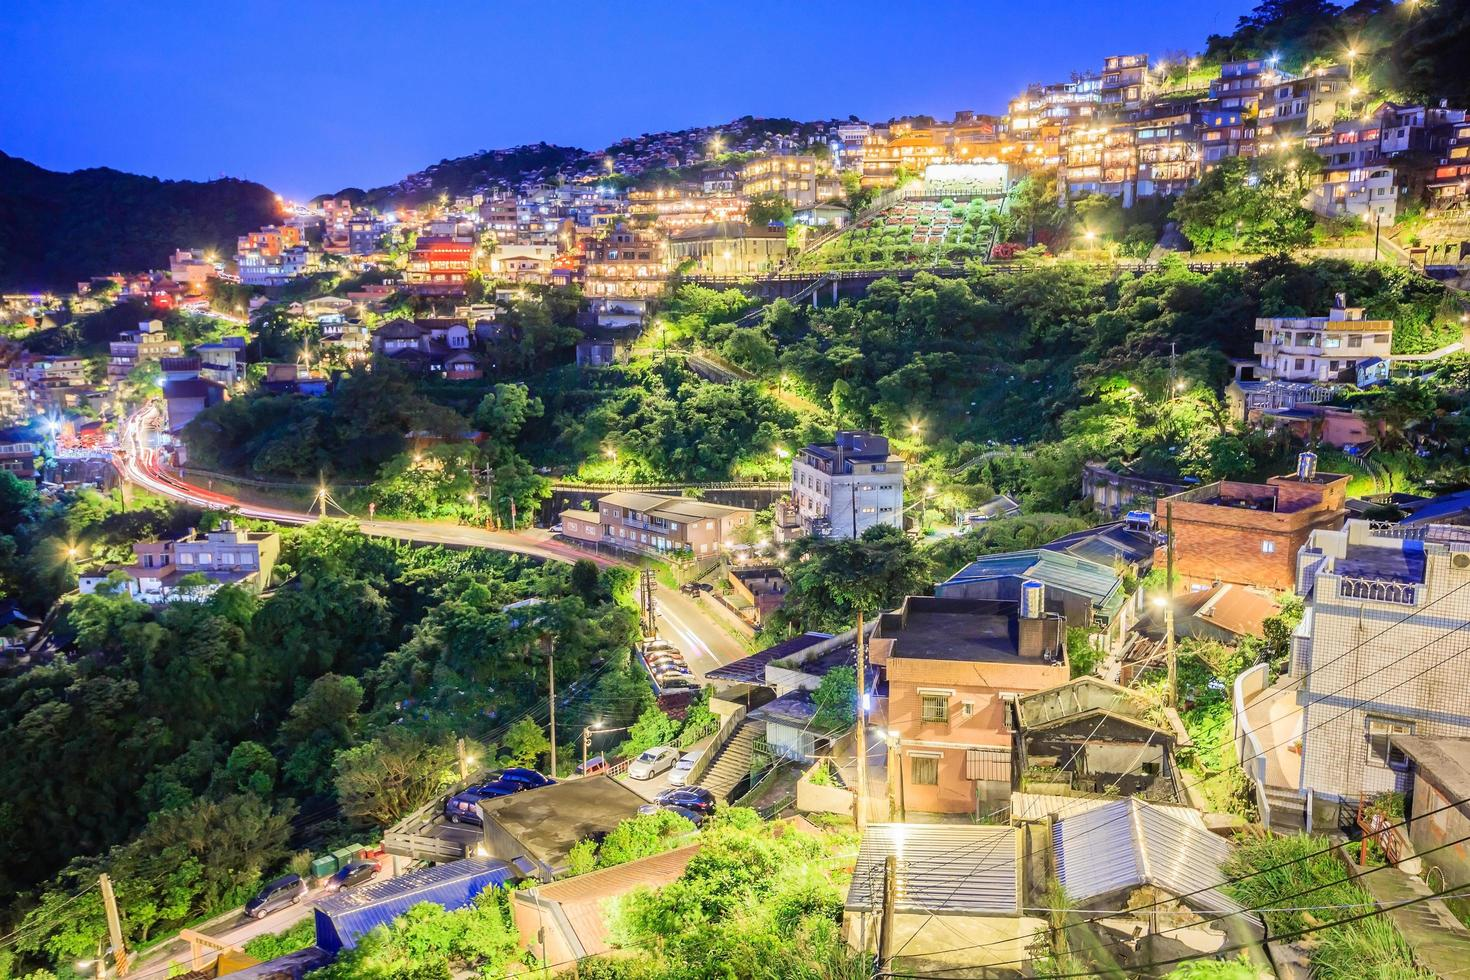 taipei, taiwan 2017-- jiufen village een bergdorp in taipei dat beroemd is om theehuizen foto